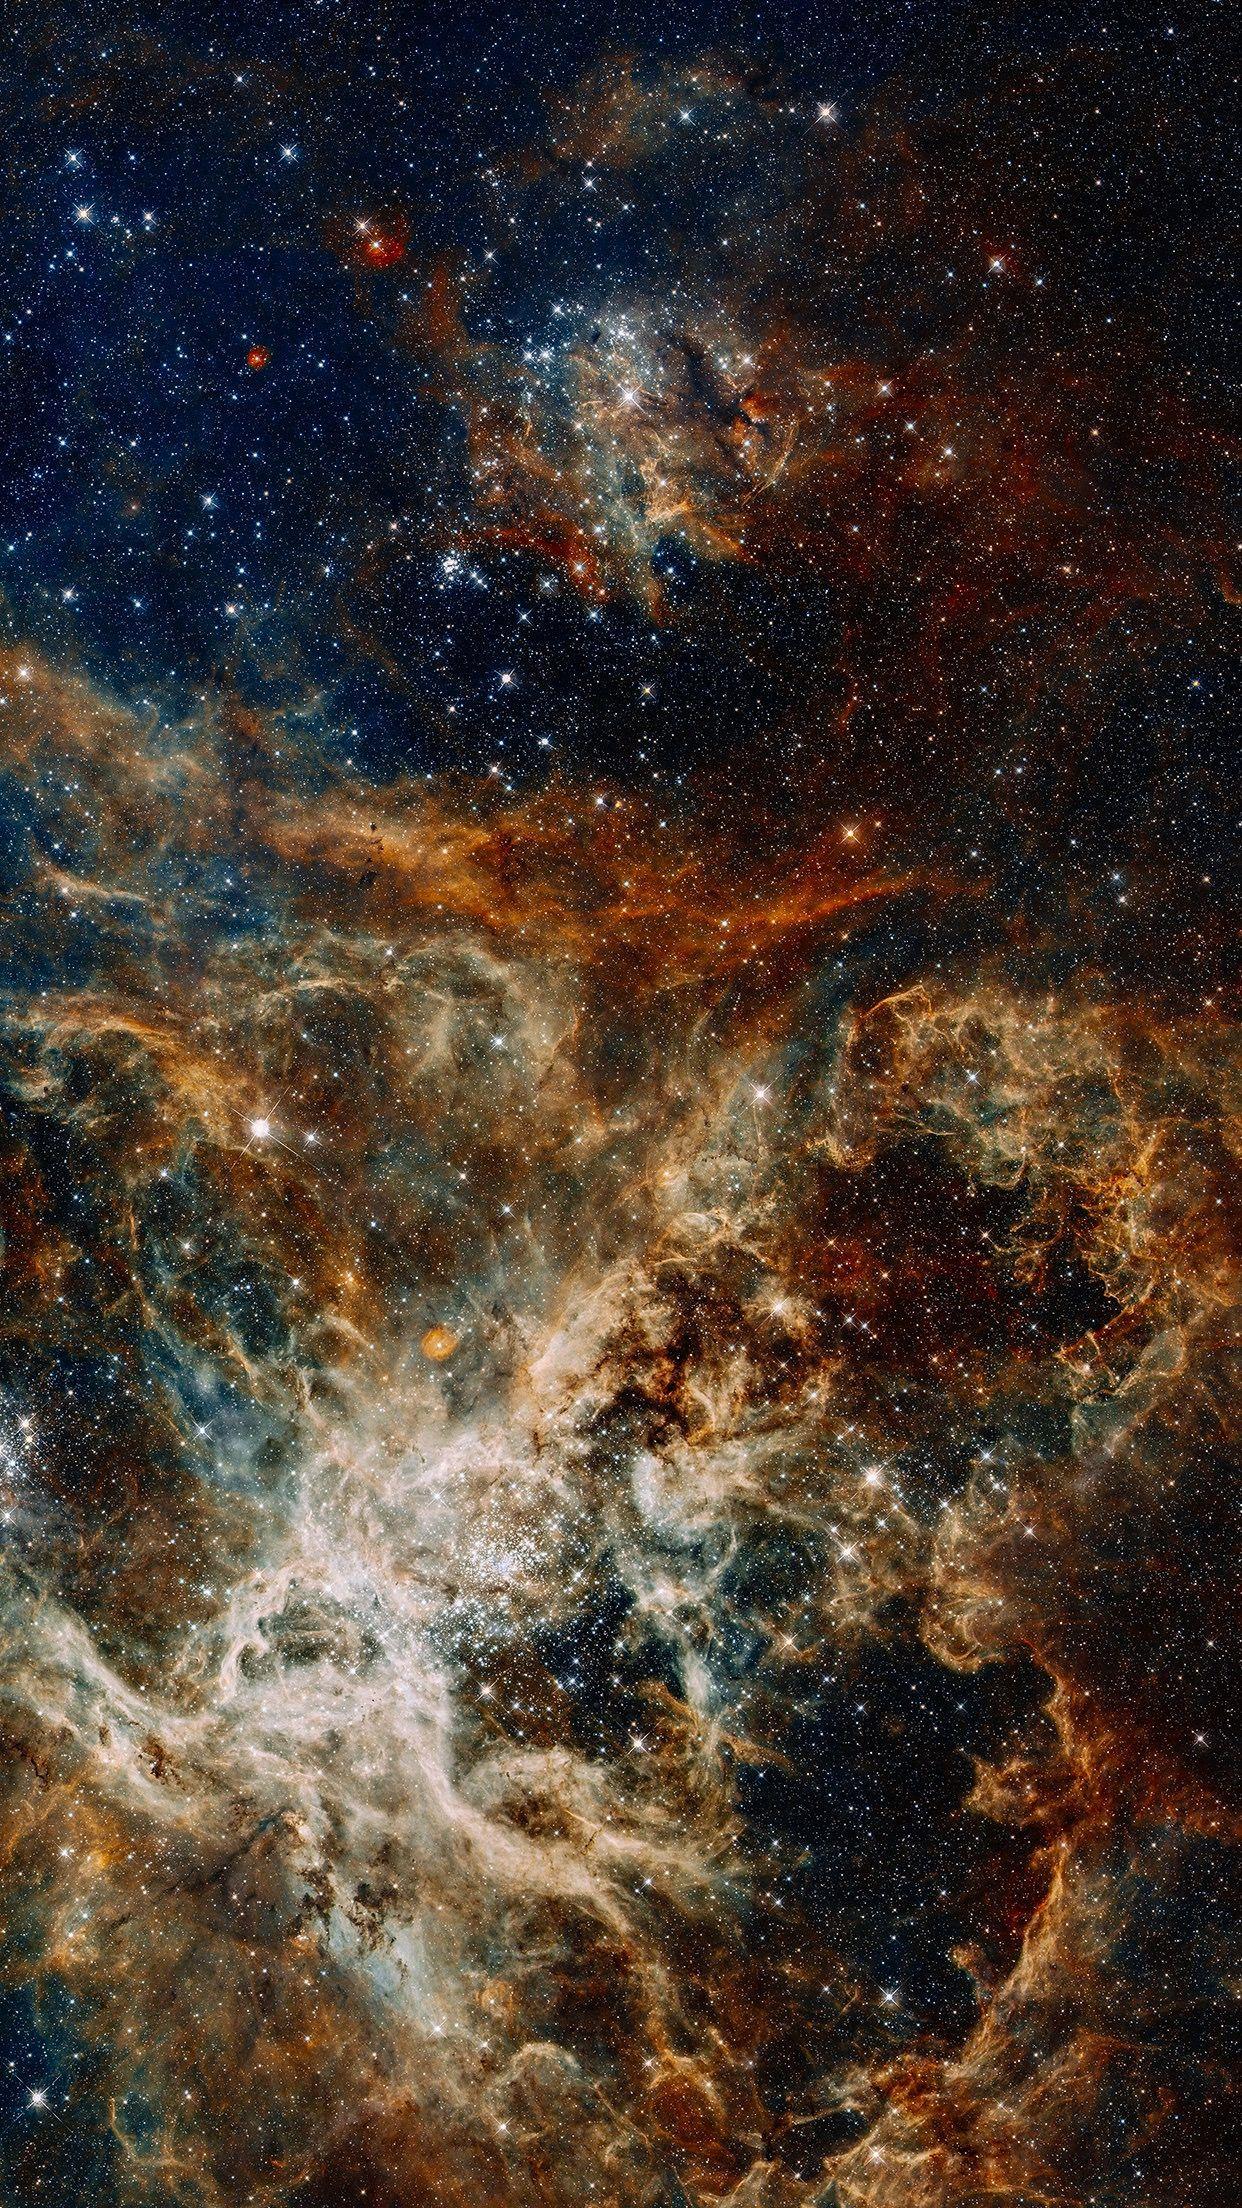 4k Ultra Hd Iphone Xr Wallpaper Mywallpapers Site Wallpaper Space Galaxy Wallpaper Space Photography